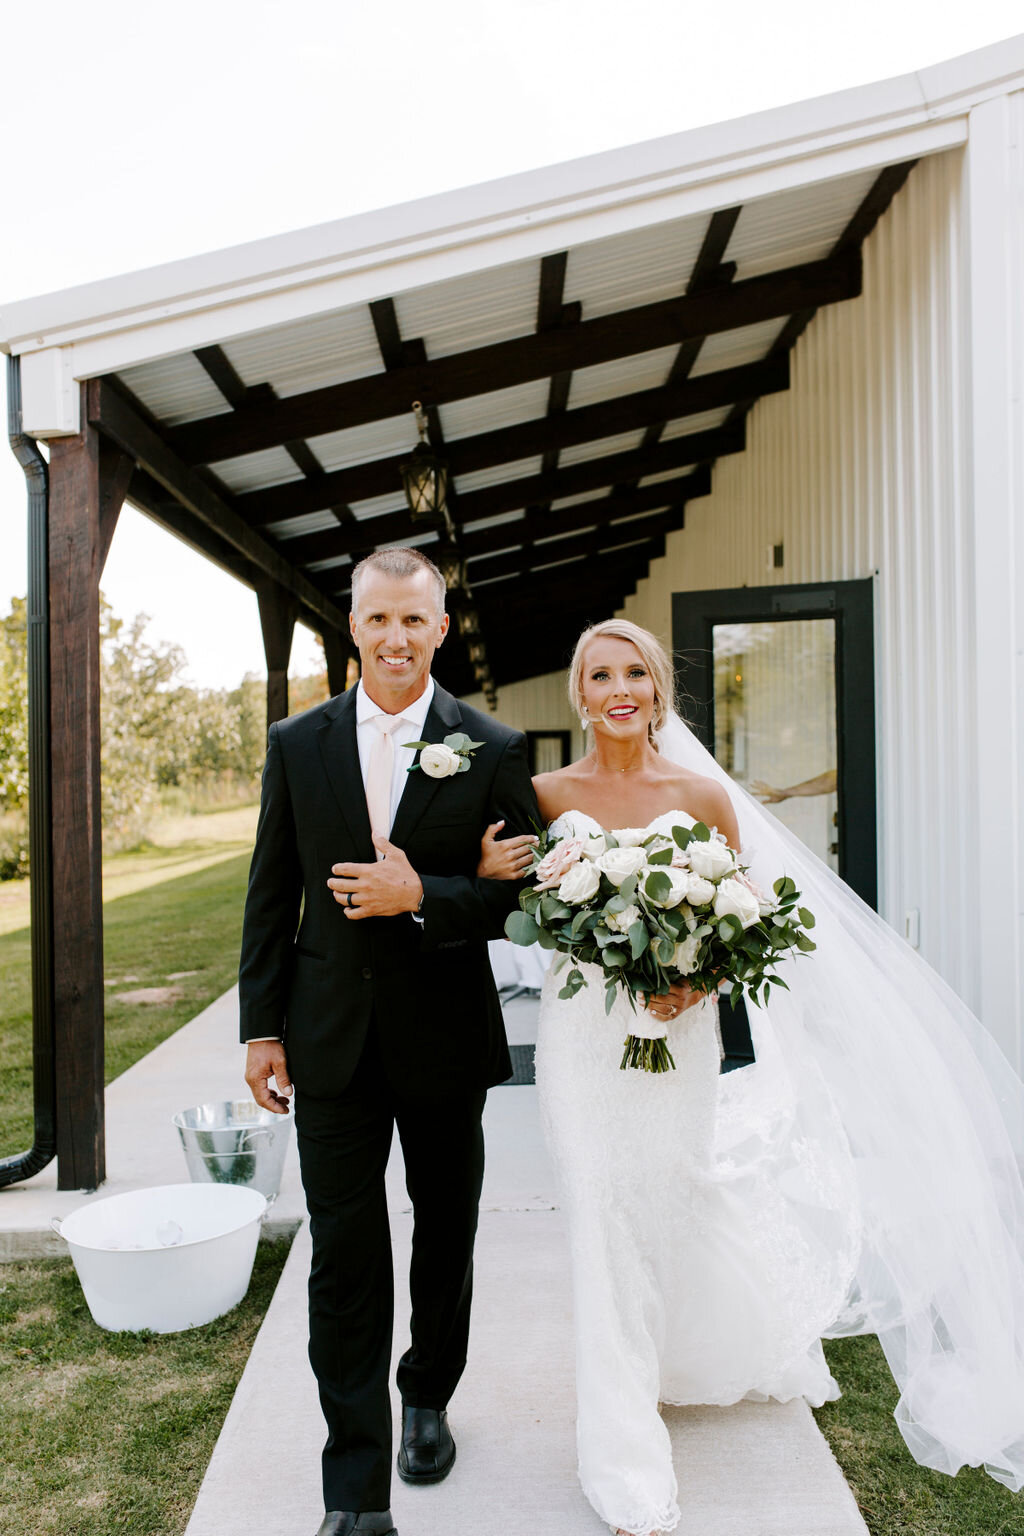 Tulsa White Barn Wedding Venue Outdoor Ceremony 81.jpg